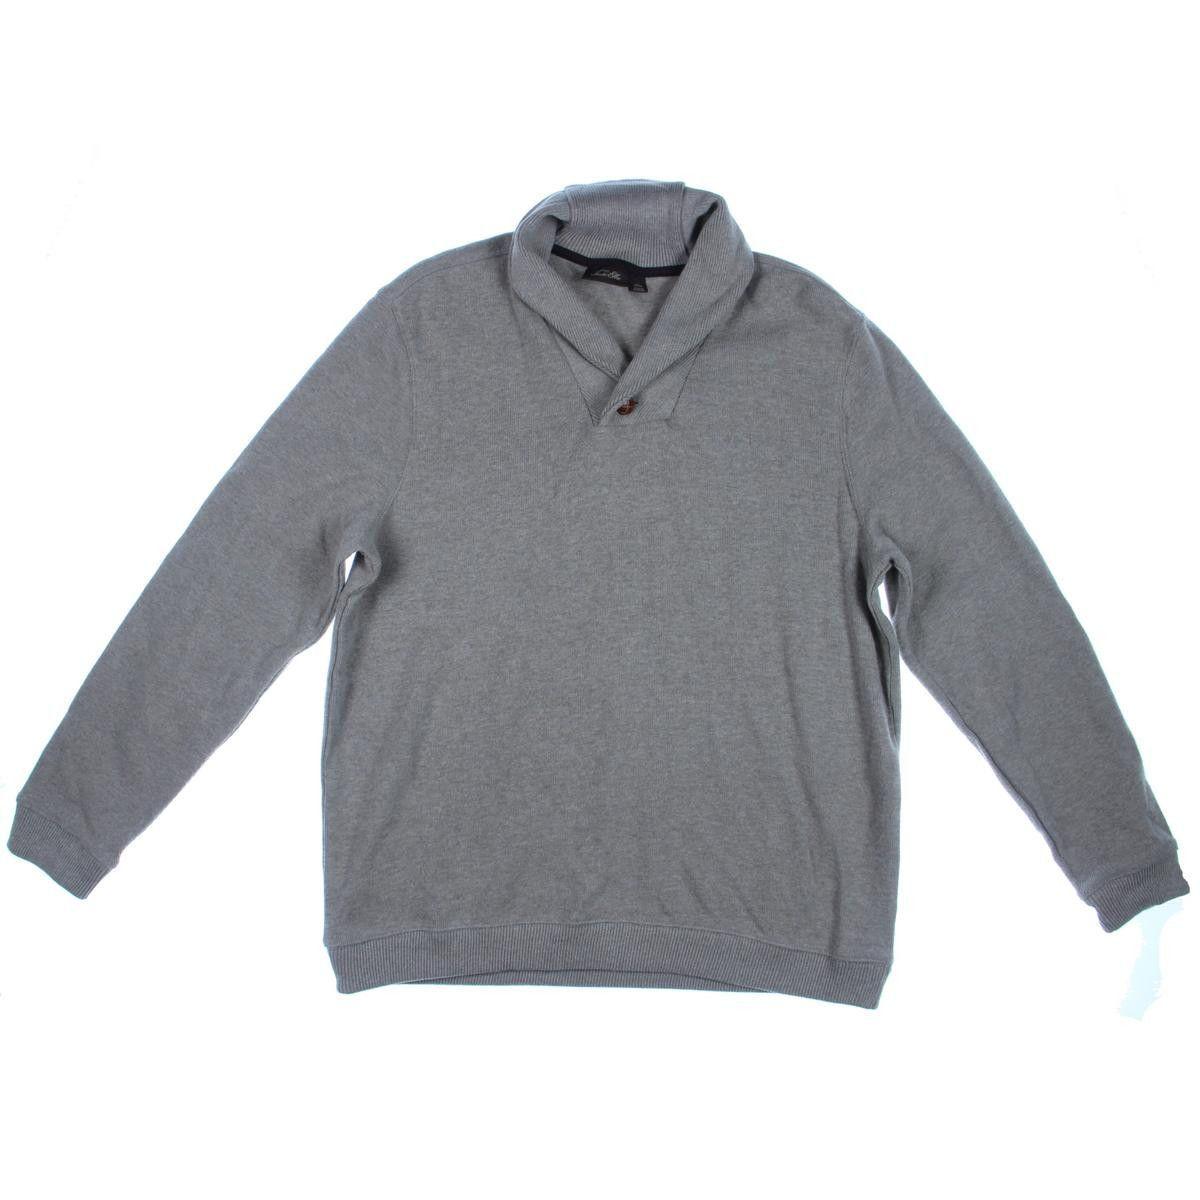 Tasso Elba Mens Cotton Ribbed Trim Shawl-Collar Sweater